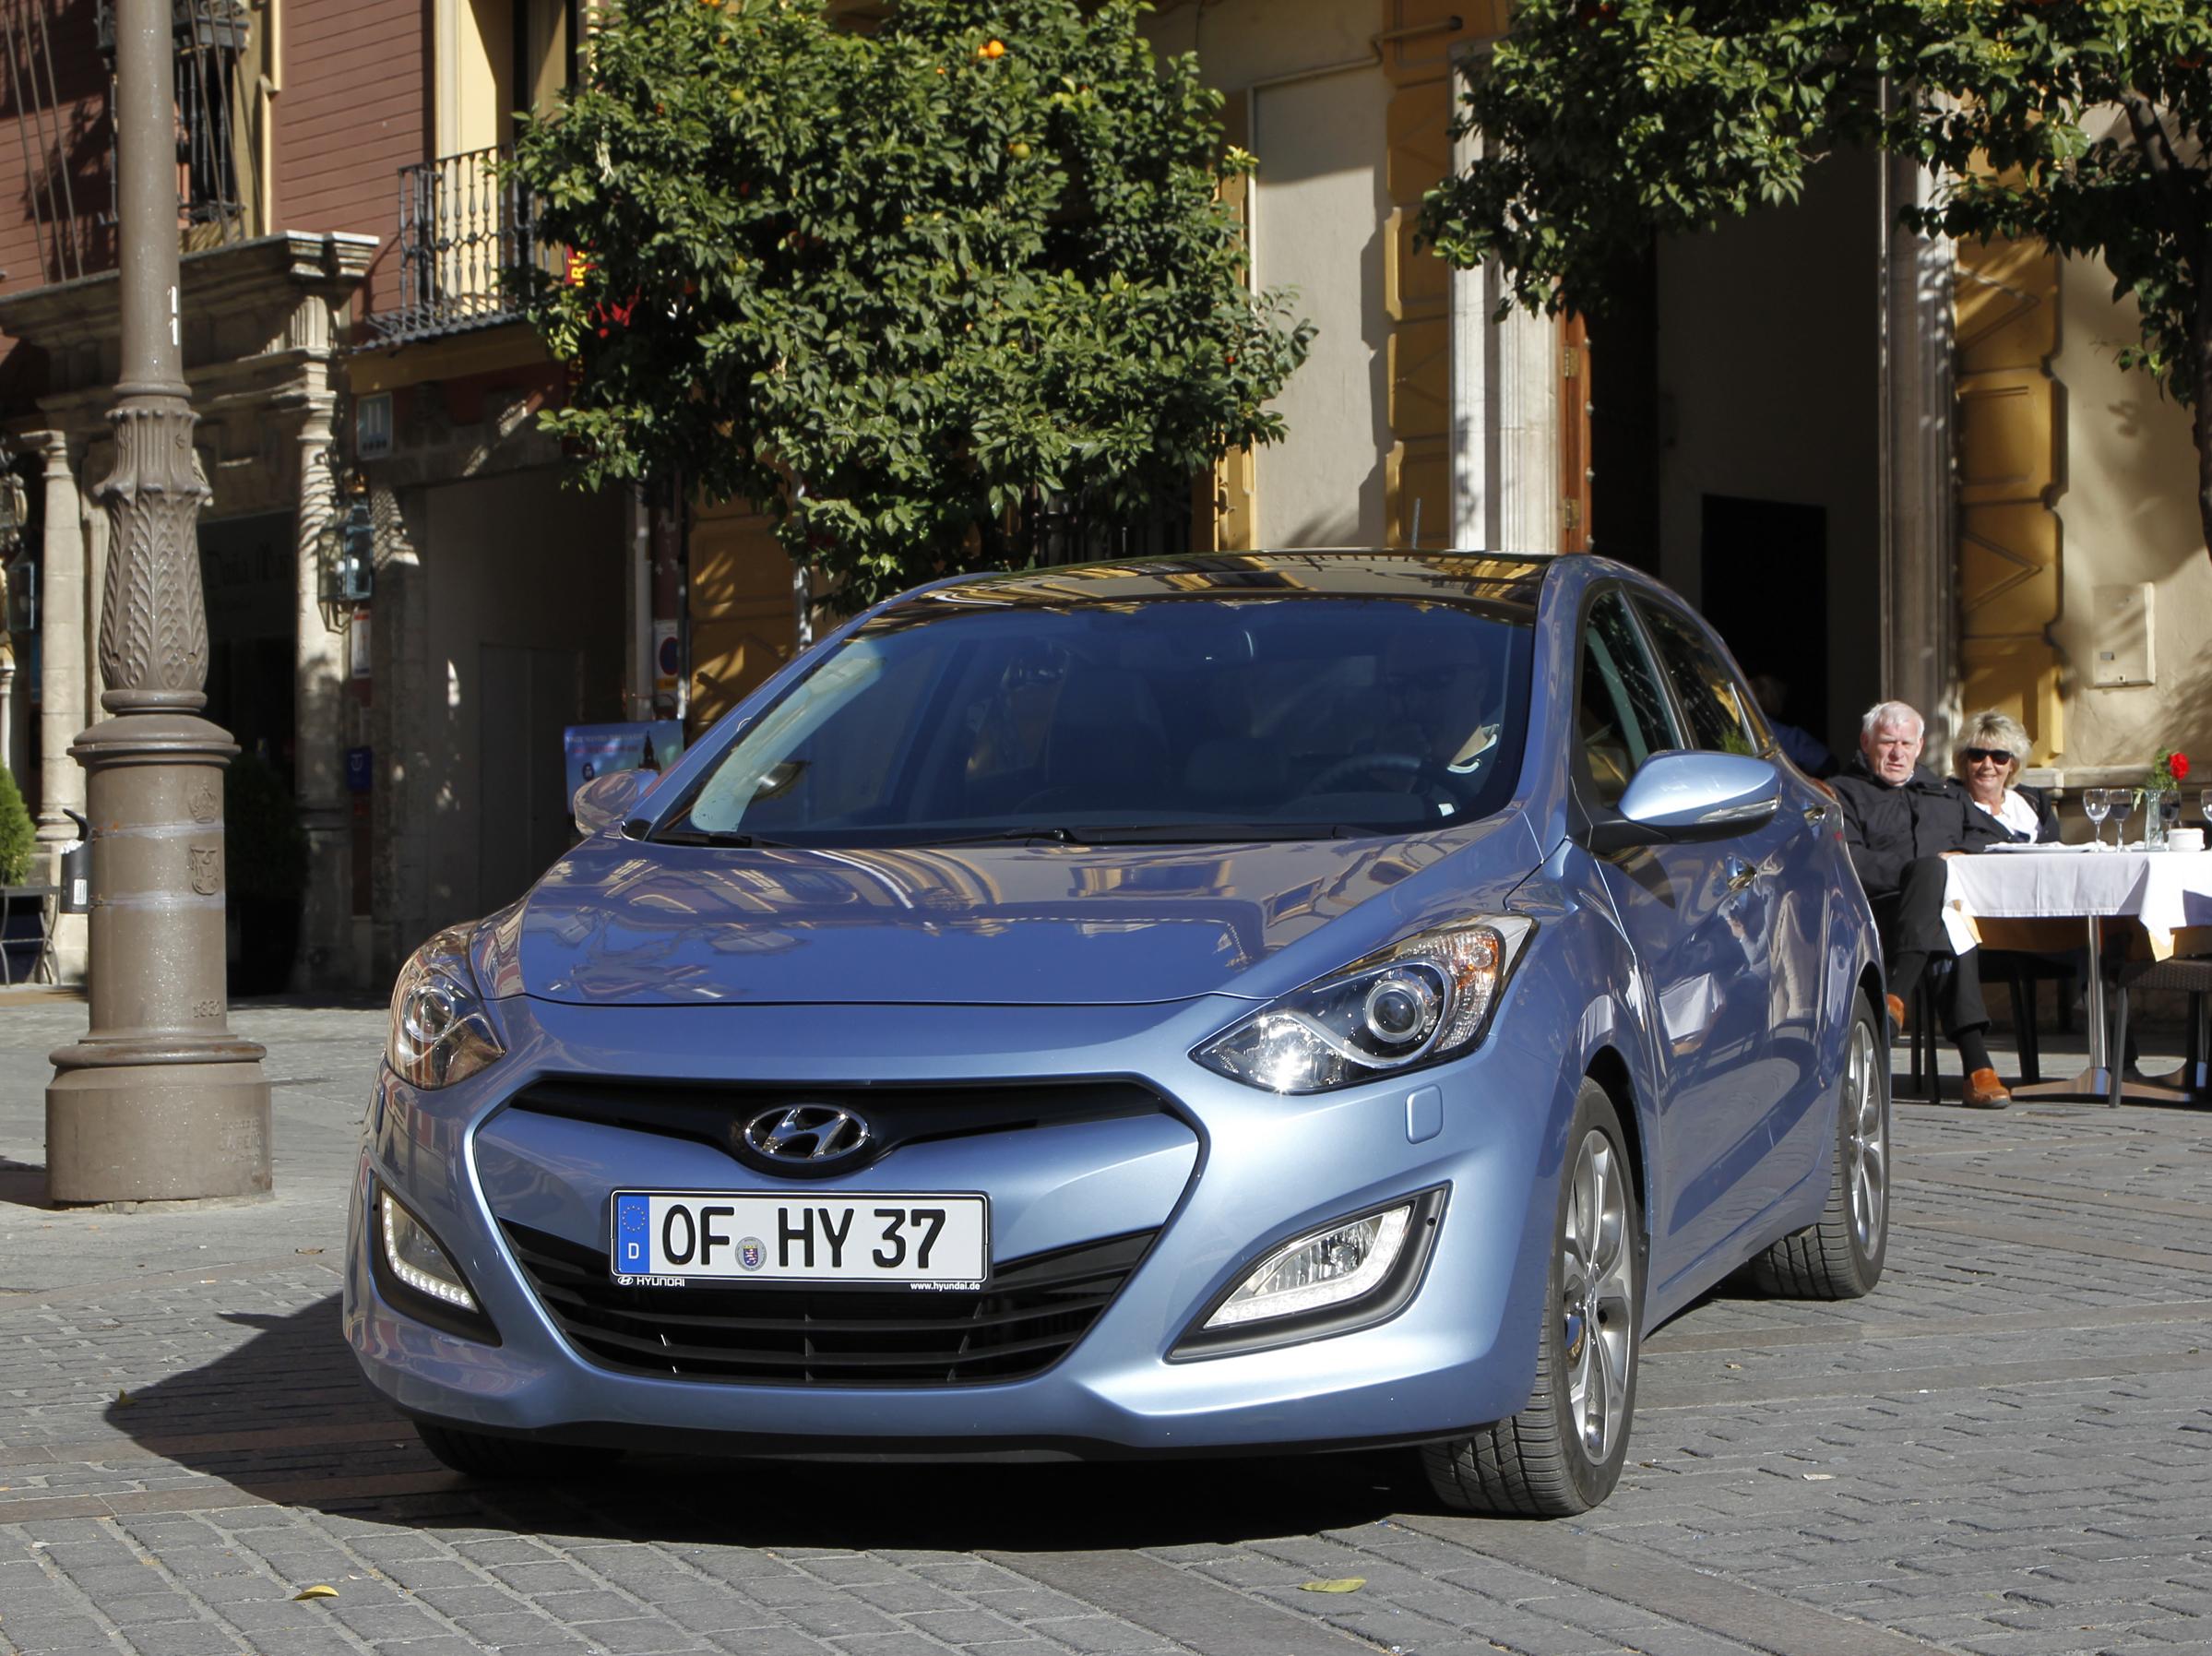 Noul Hyundai i30 a ajuns în România. Preț minim: 14.437 euro